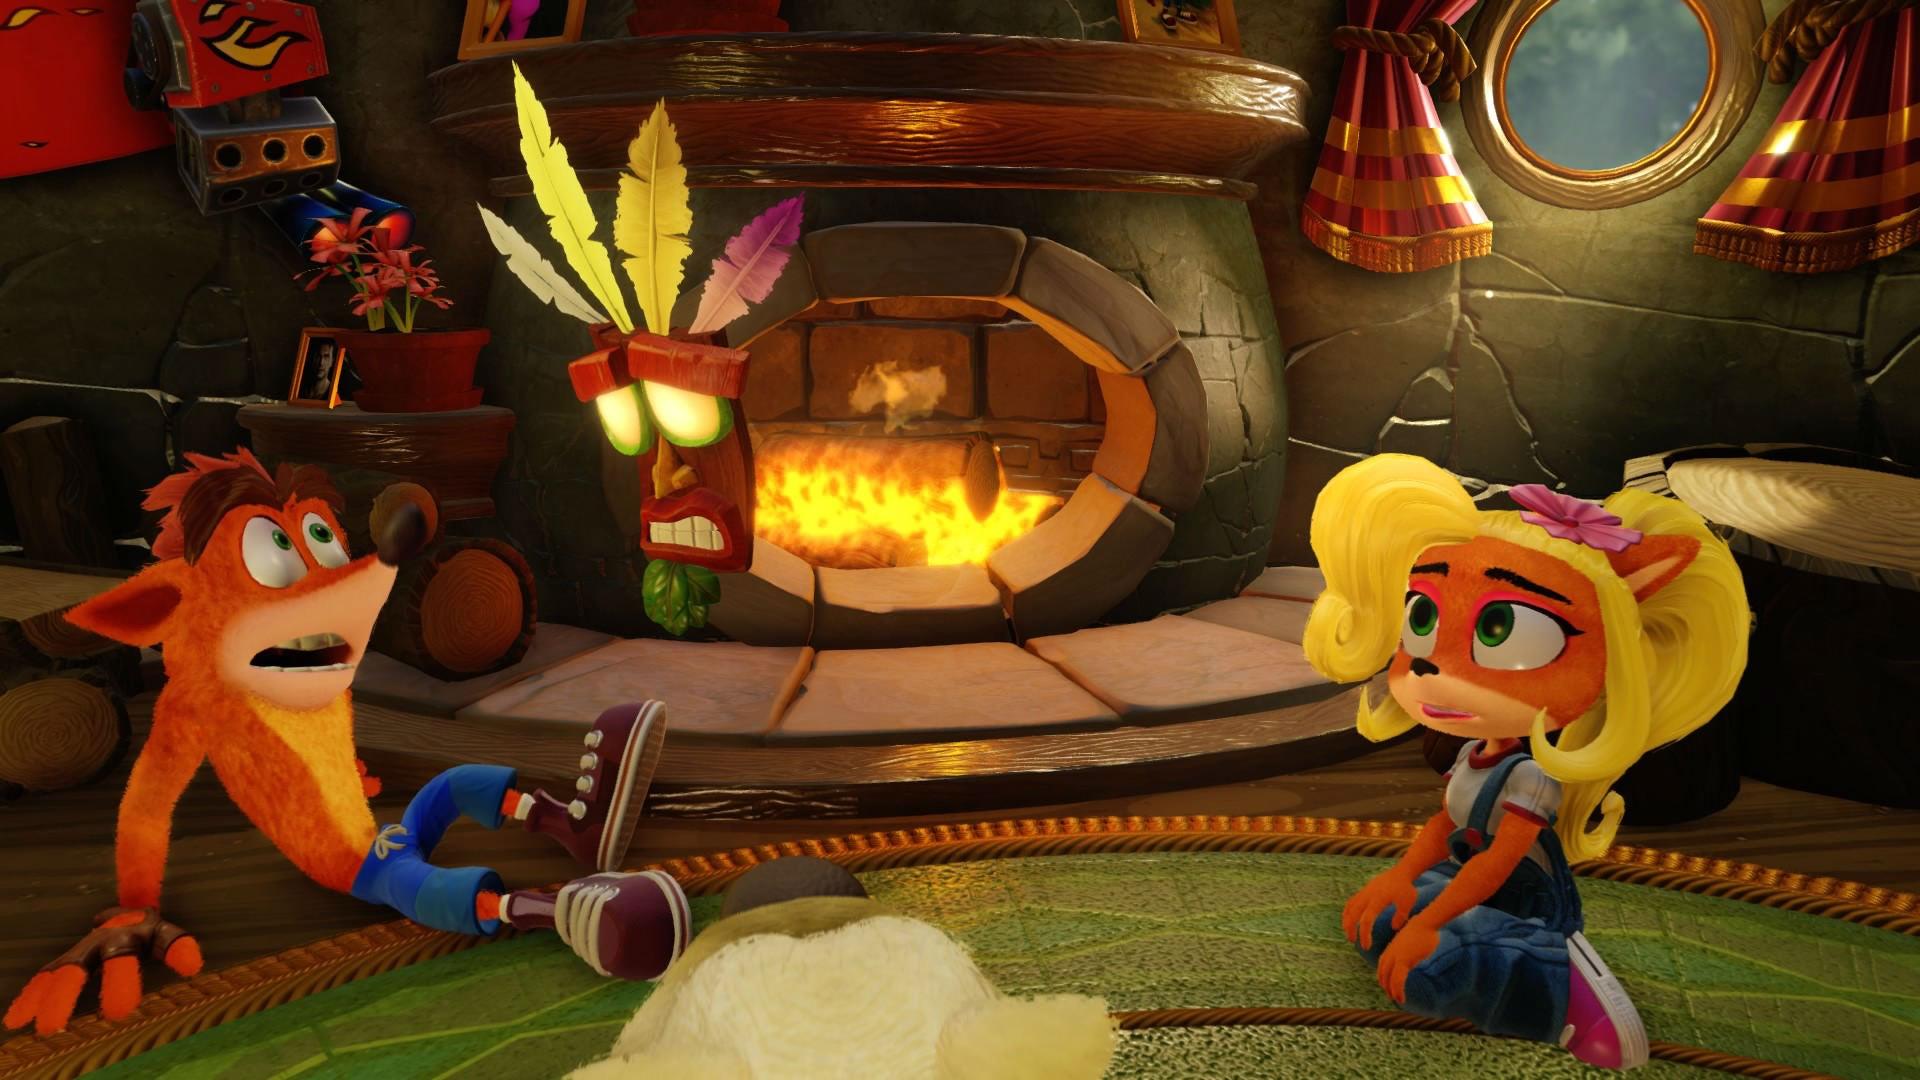 Crash Bandicoot 4 Has Local Multiplayer, According to PSN